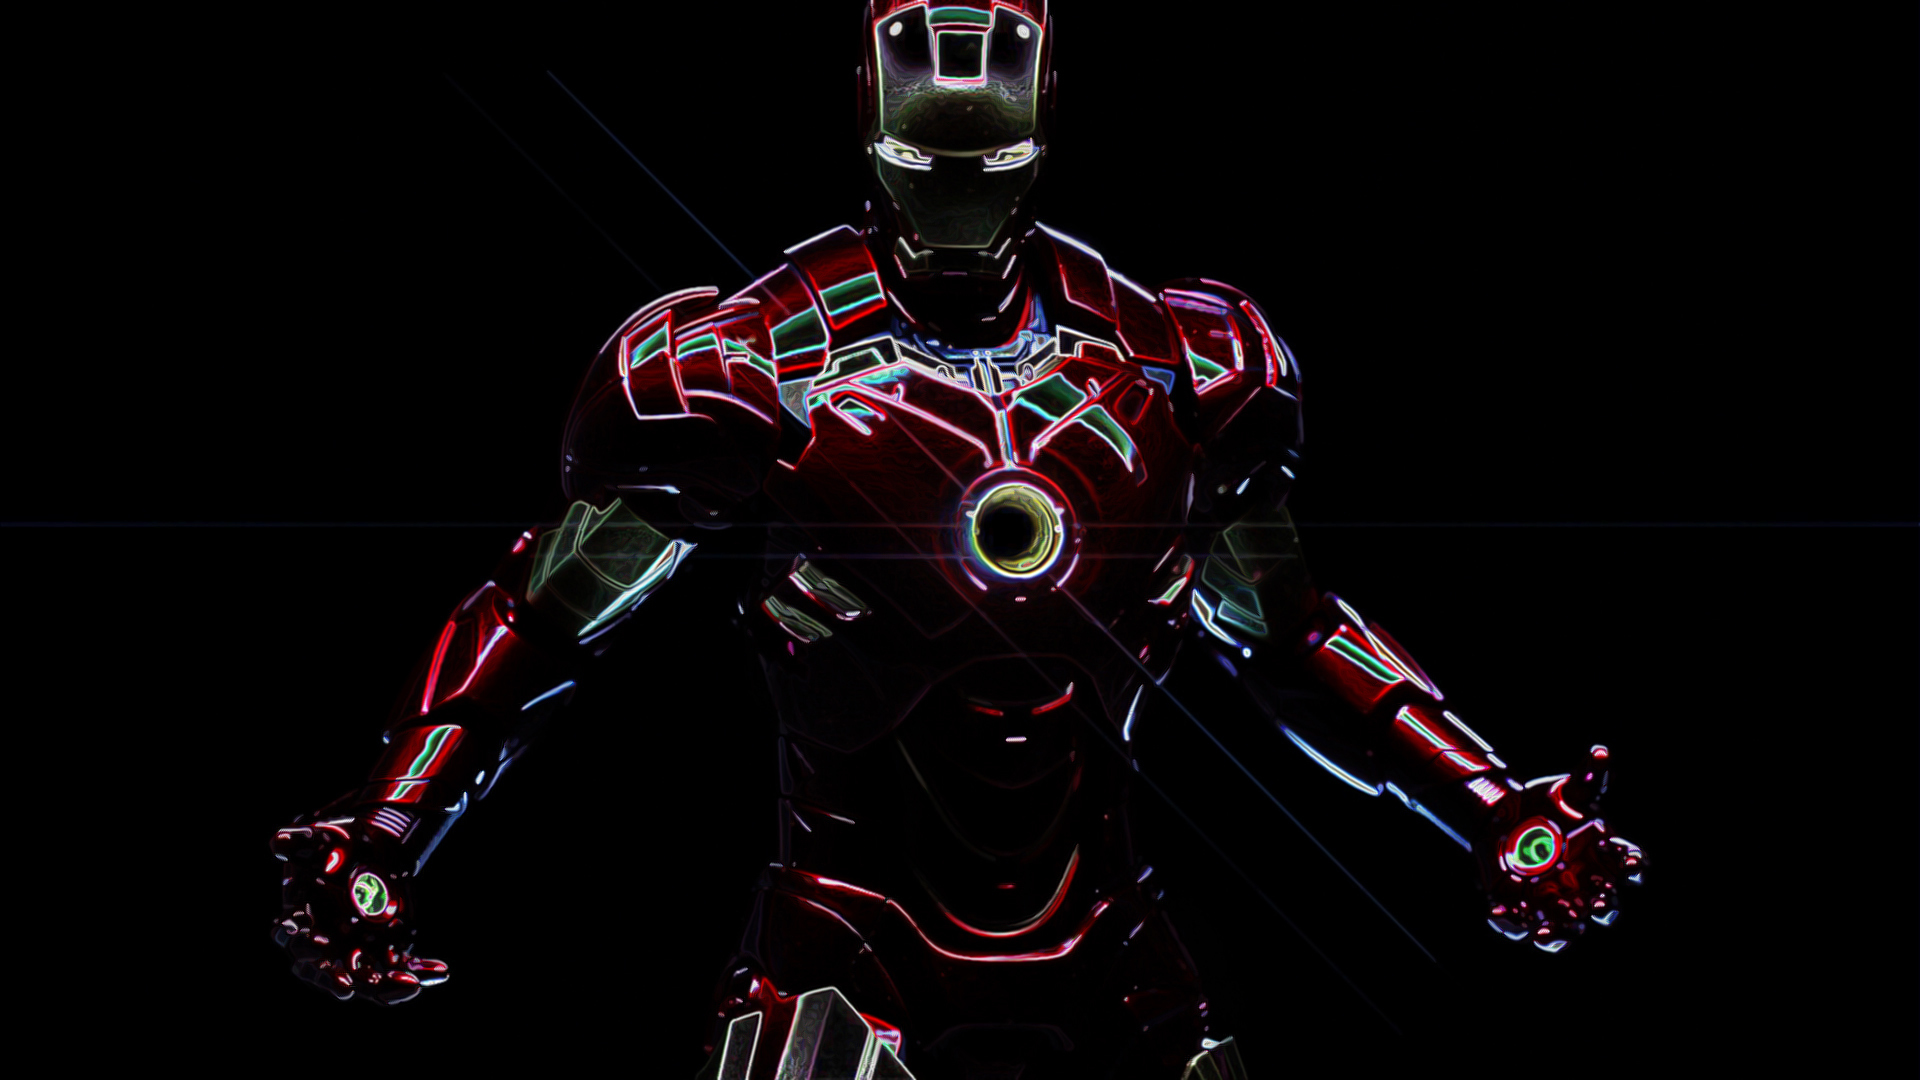 Iron Man Wallpaper Sketch  Hd Desktop Wallpapers  4k Hd